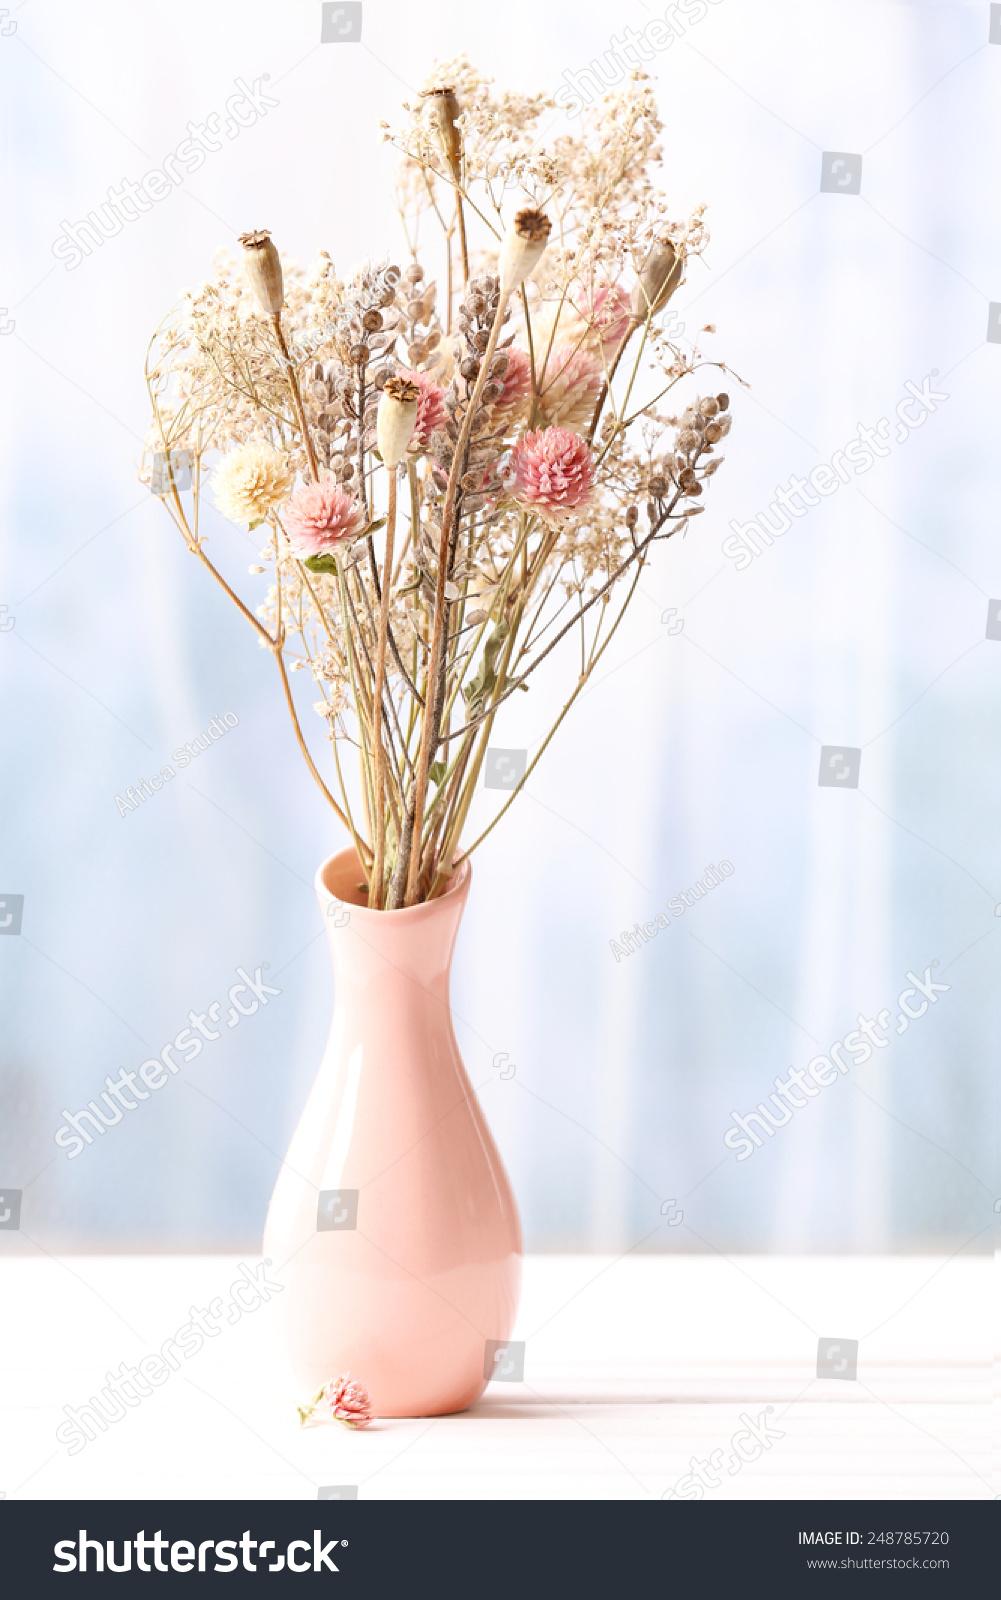 Bouquet dried flowers vase on light stock photo edit now 248785720 bouquet of dried flowers in vase on light background izmirmasajfo